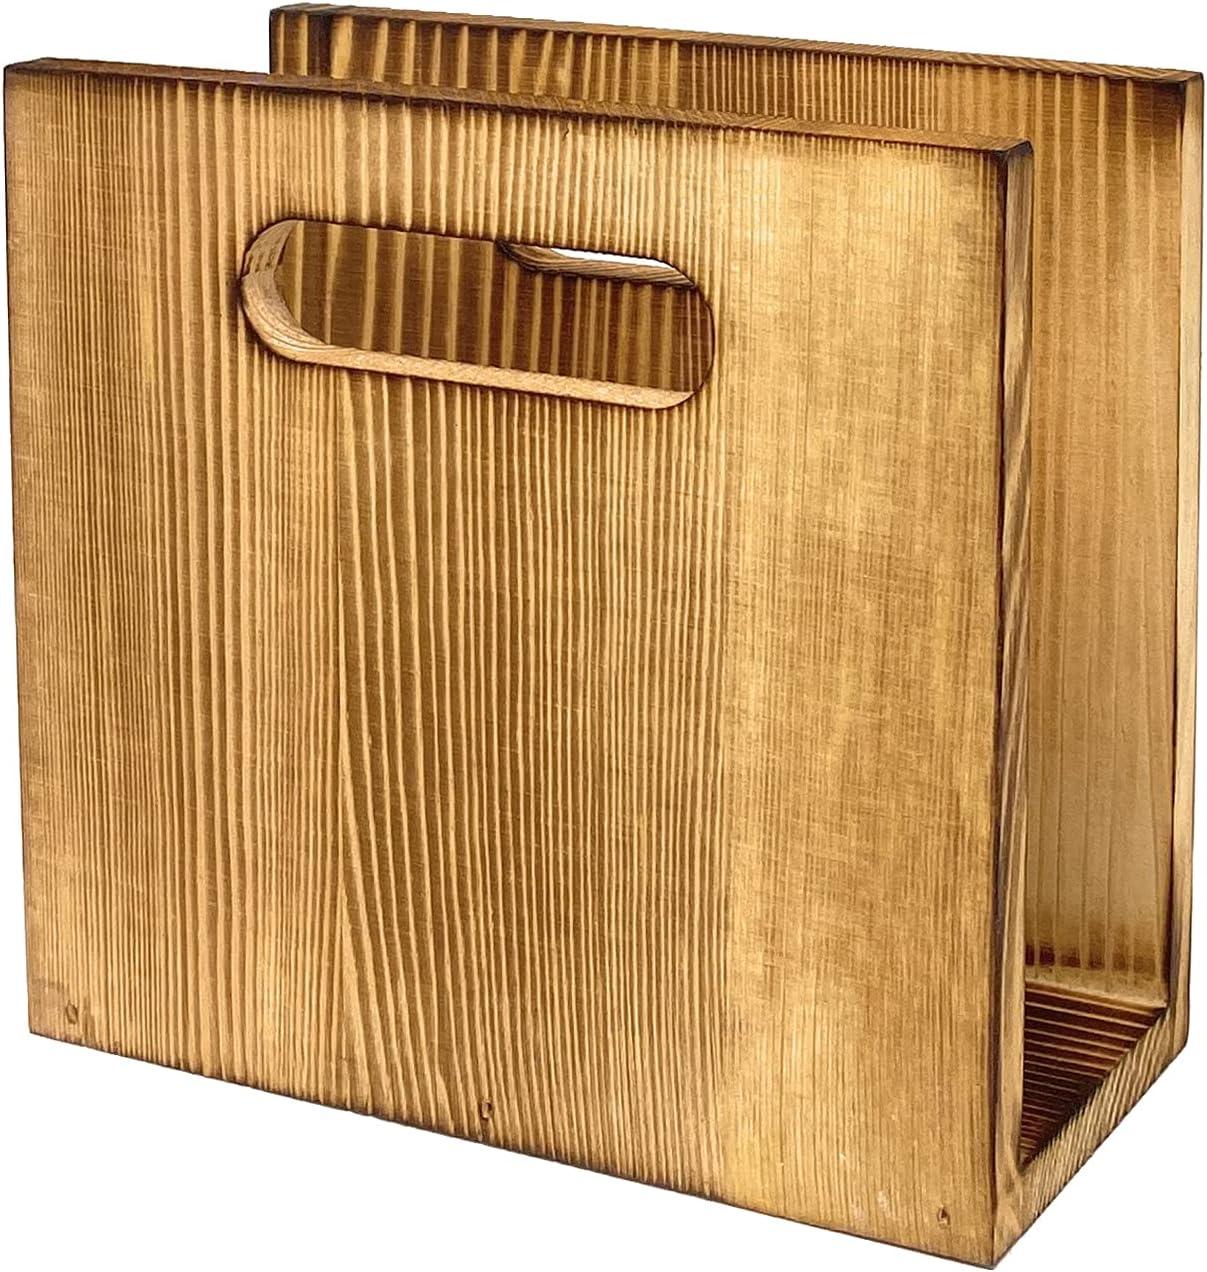 Wood Napkin overseas Holder for Inexpensive Farmhouse Coun Decoration Rustic Kitchen